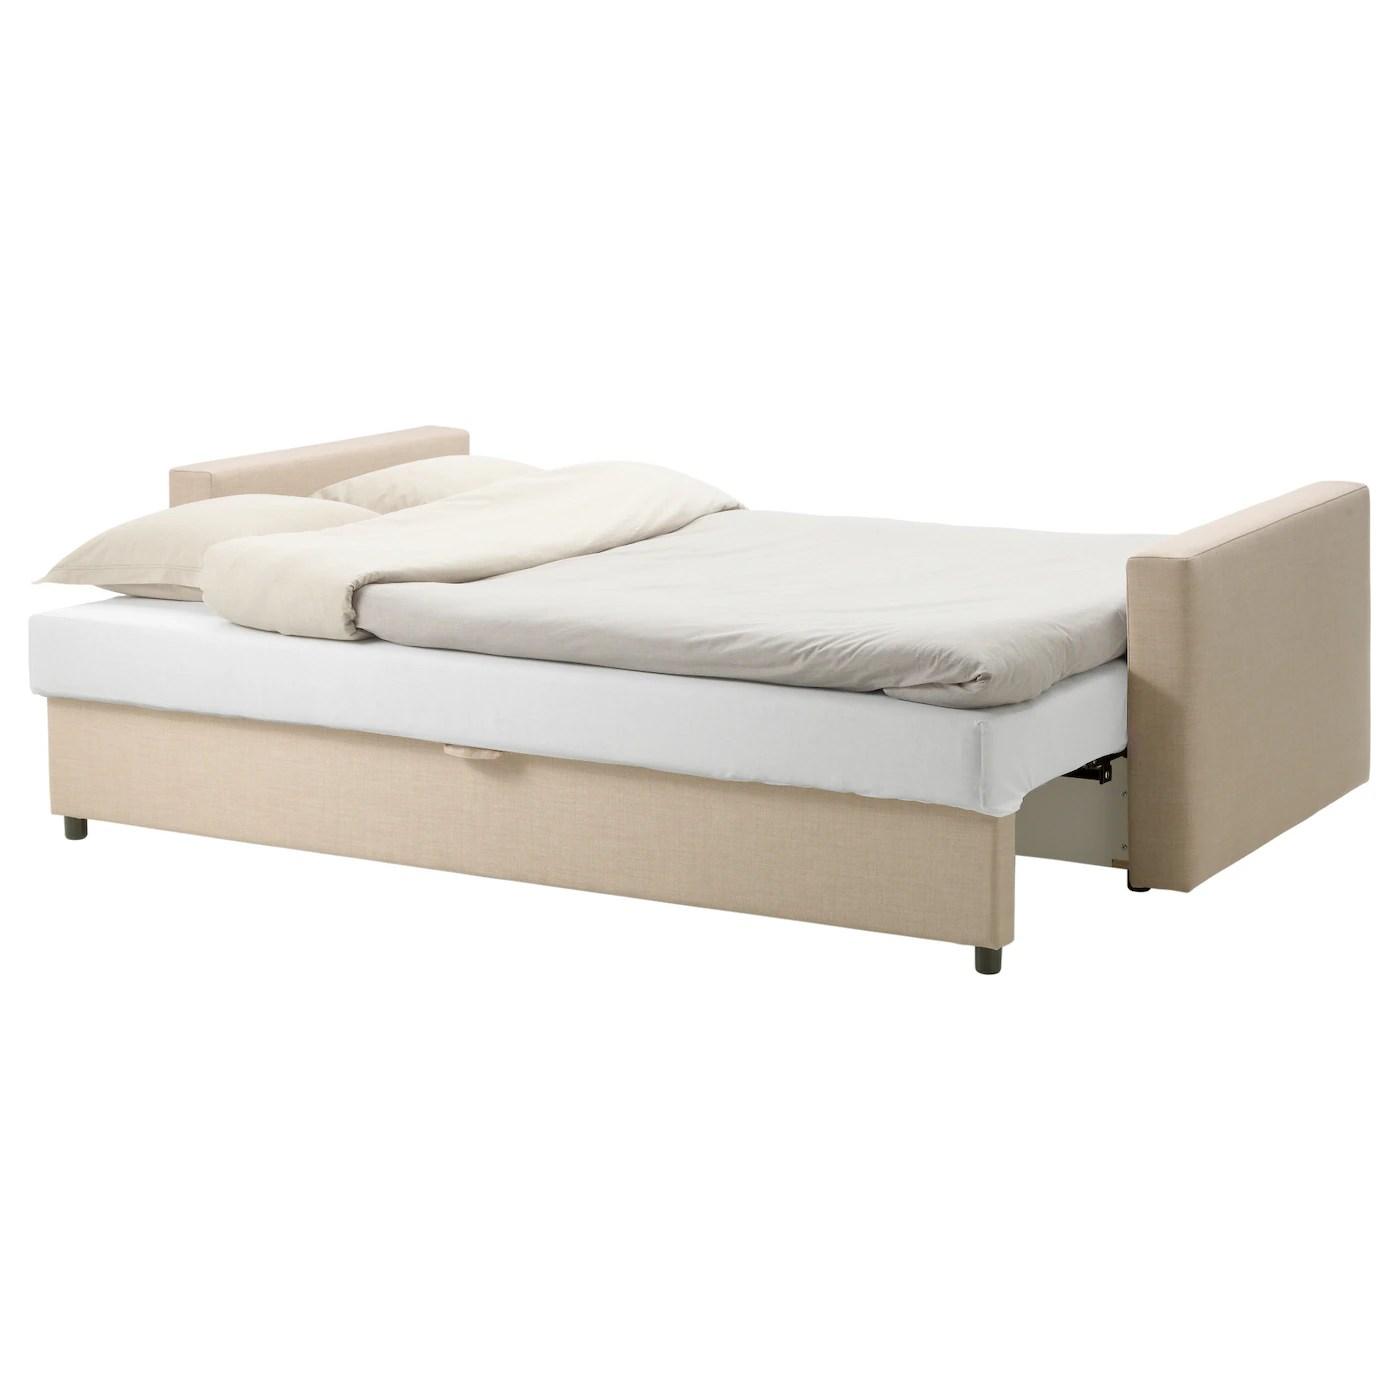 friheten corner sofa bed skiftebo beige how to re plump cushions three seat ikea